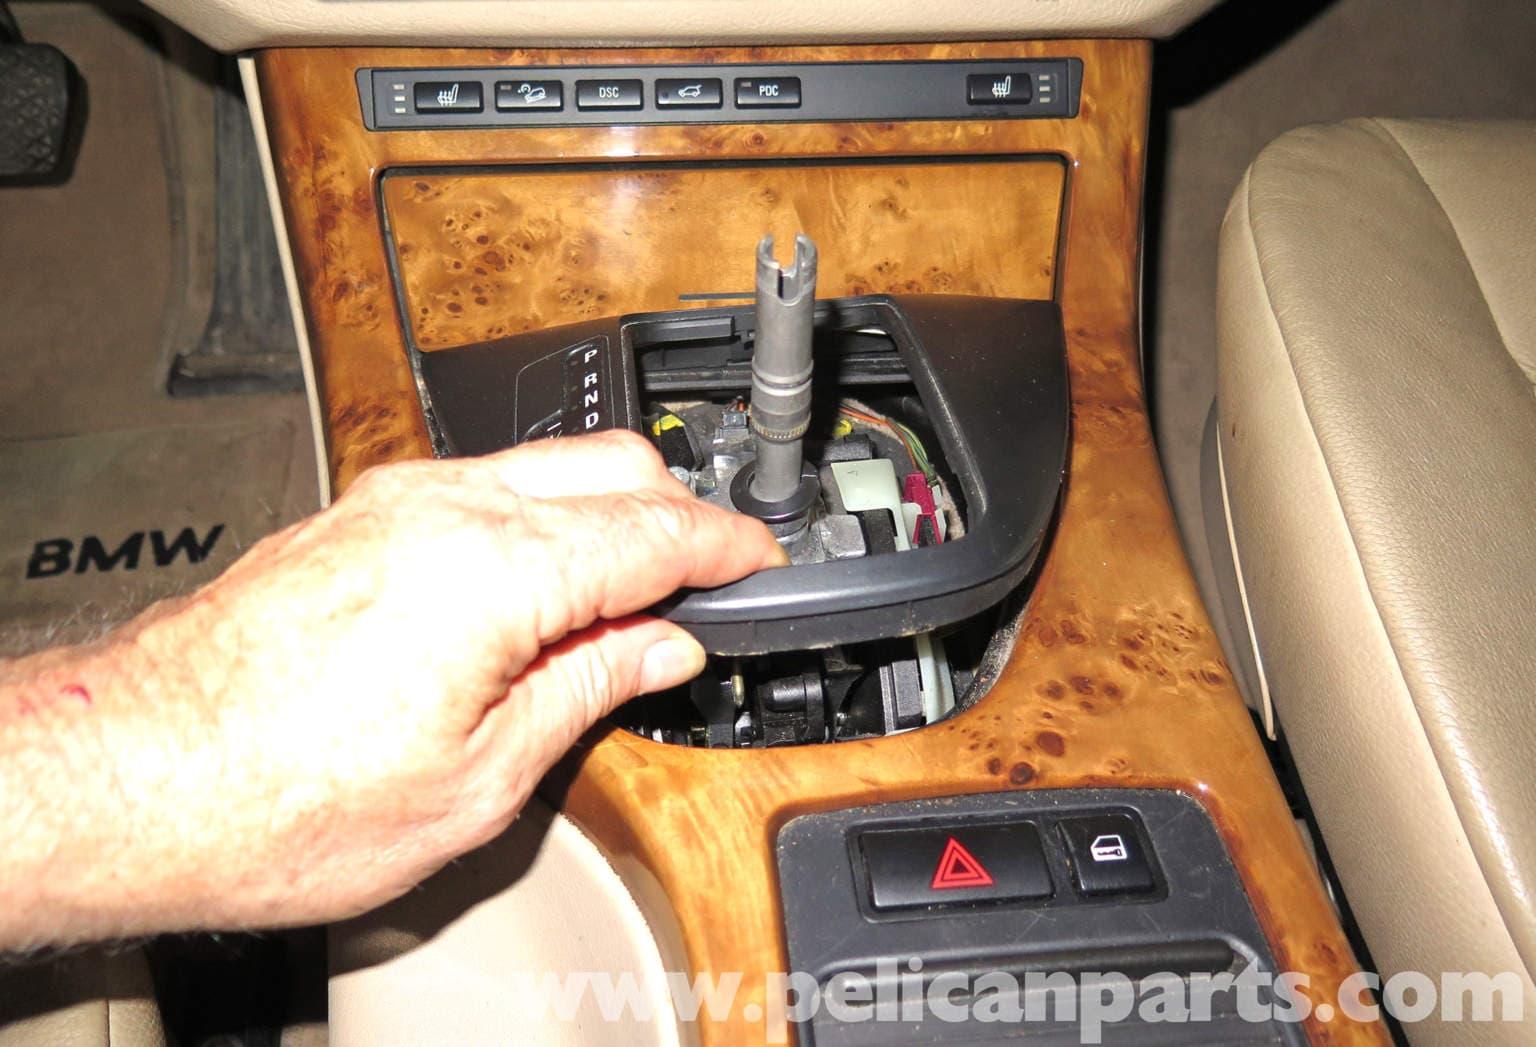 Bmw X5 Center Console Replacement E53 2000 2006 Pelican Parts Diy Maintenance Article